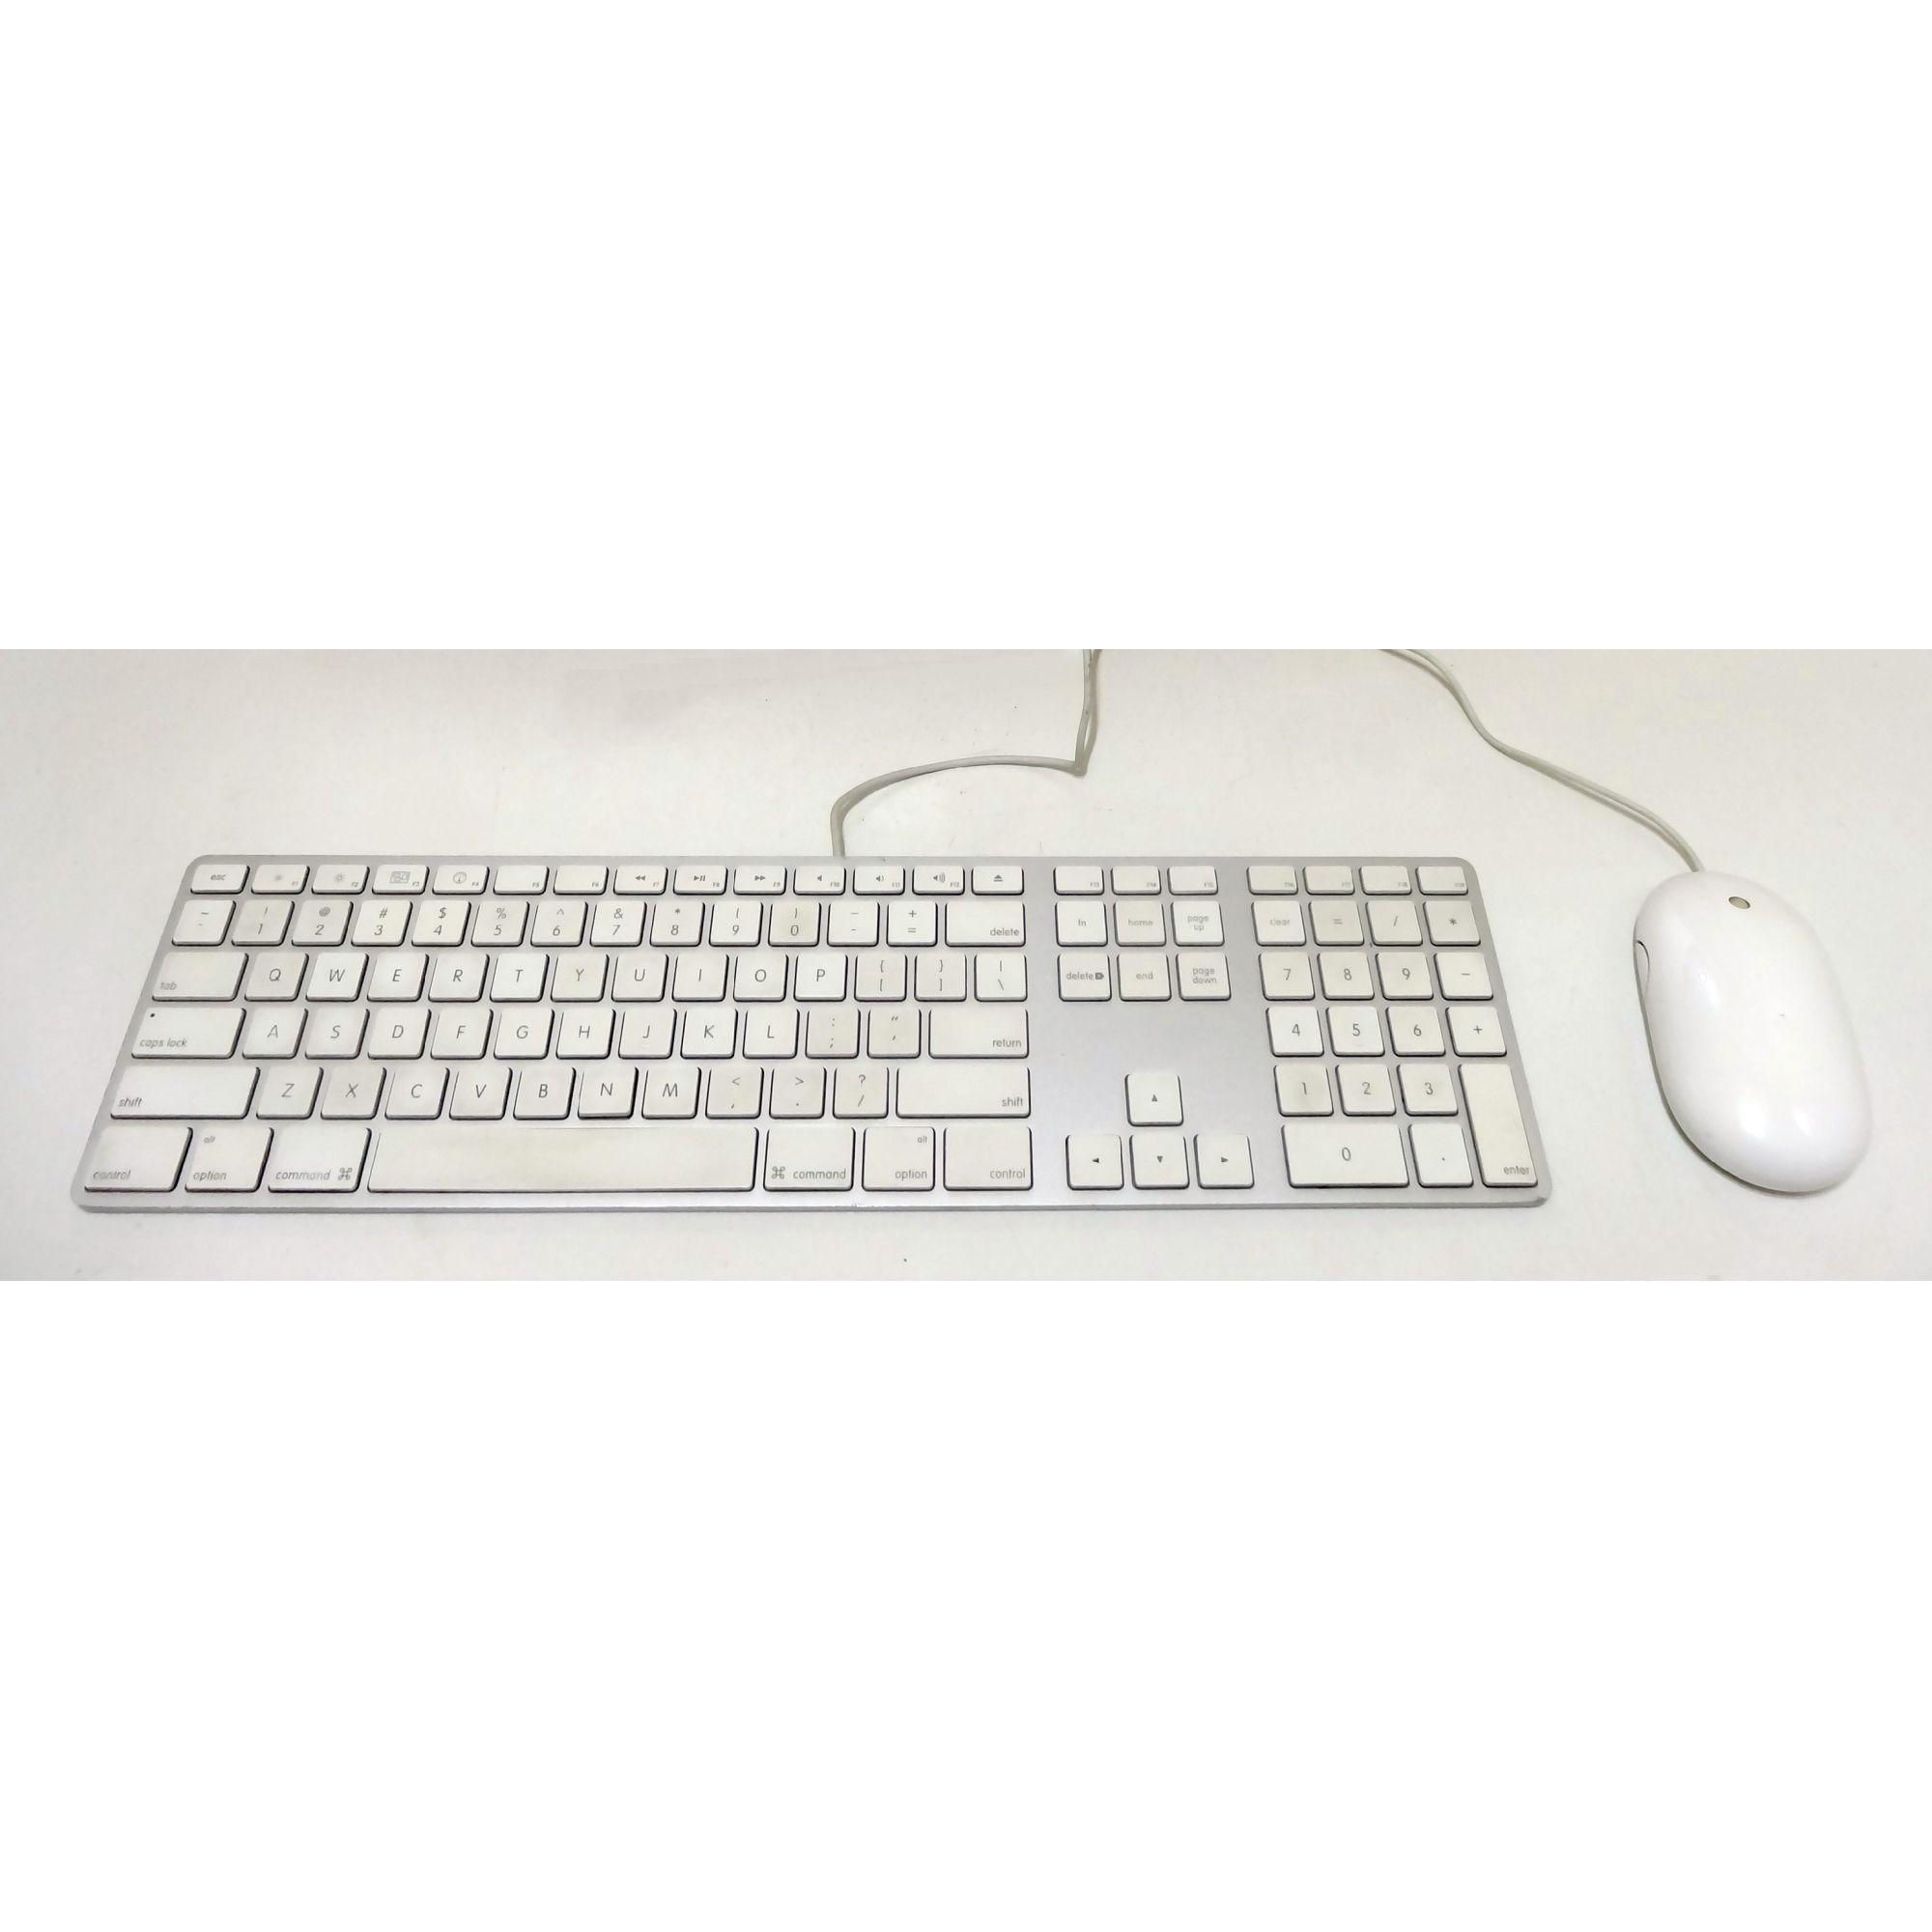 iMac MA876LL/A 20'' Intel Core 2 DUO 2.00GHz 4GB HD-500GB | DEDICADA - 128MB (NÃO ENVIAMOS)